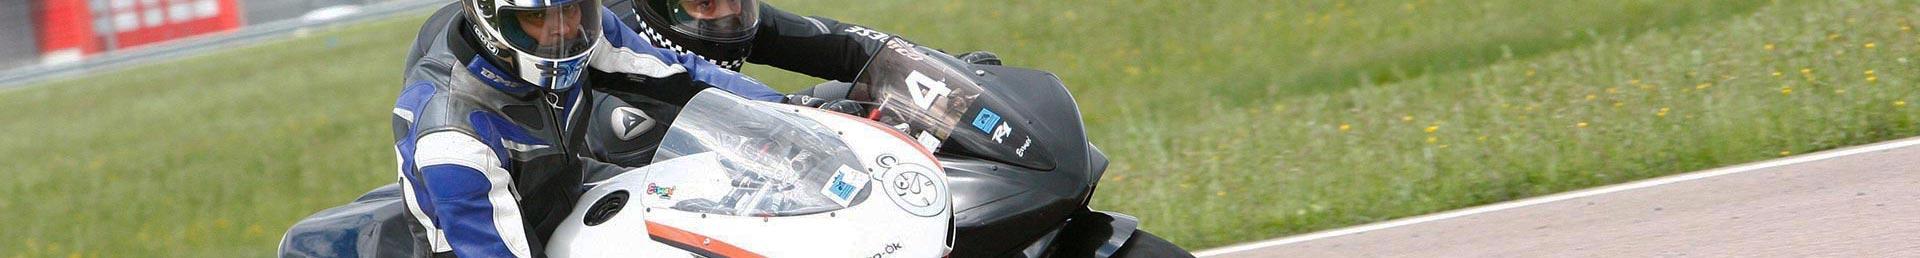 Moto Haute-Garonne